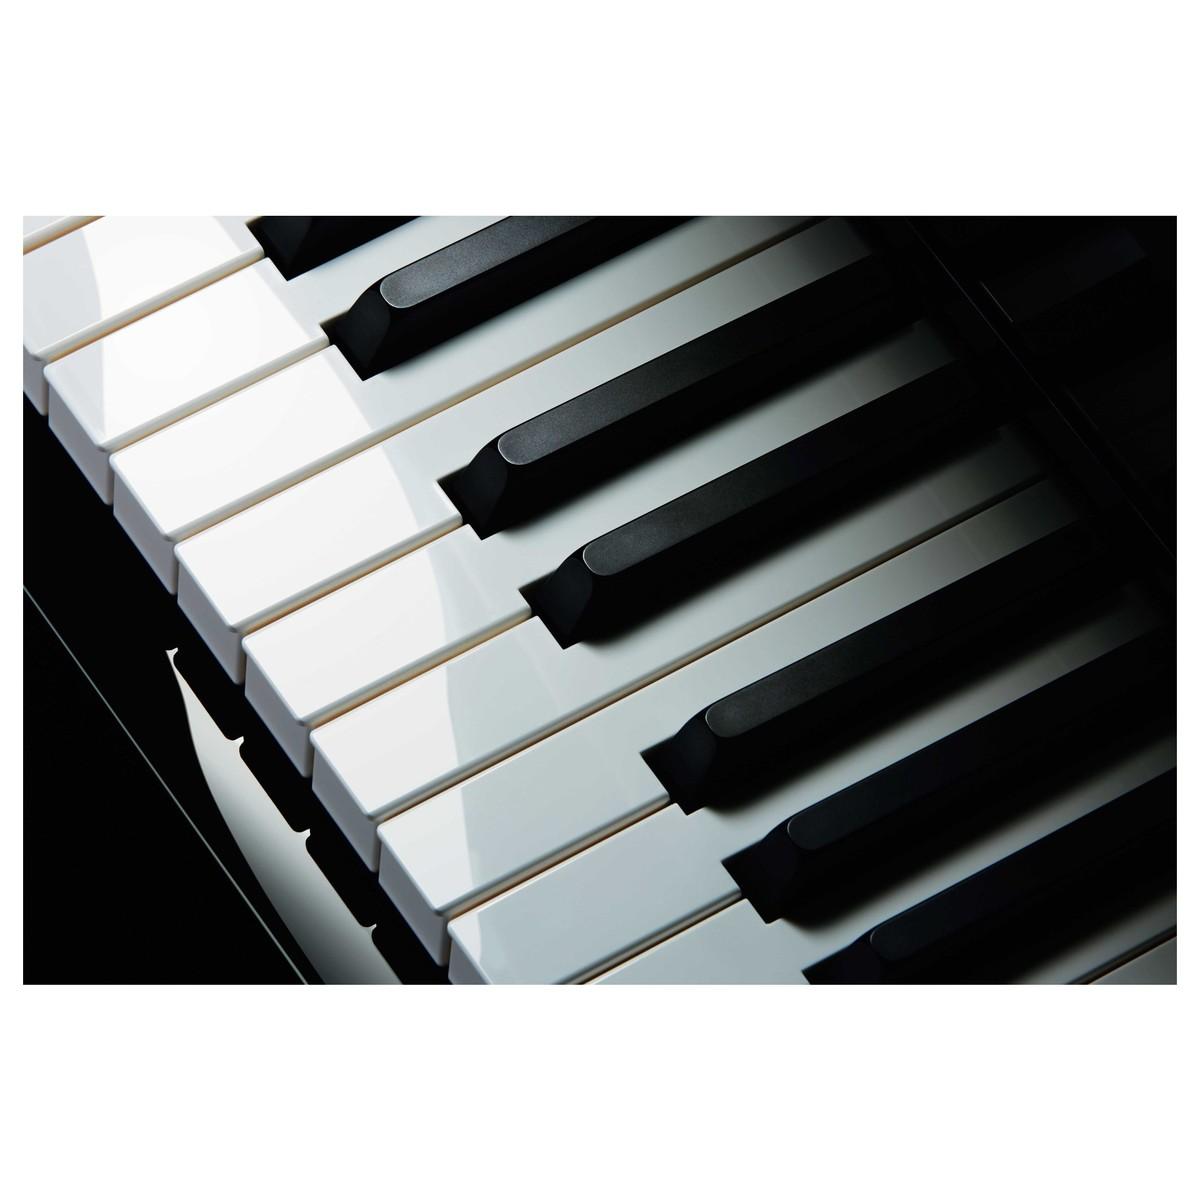 Casio GP-500 Grand Hybrid Piano ivory keys